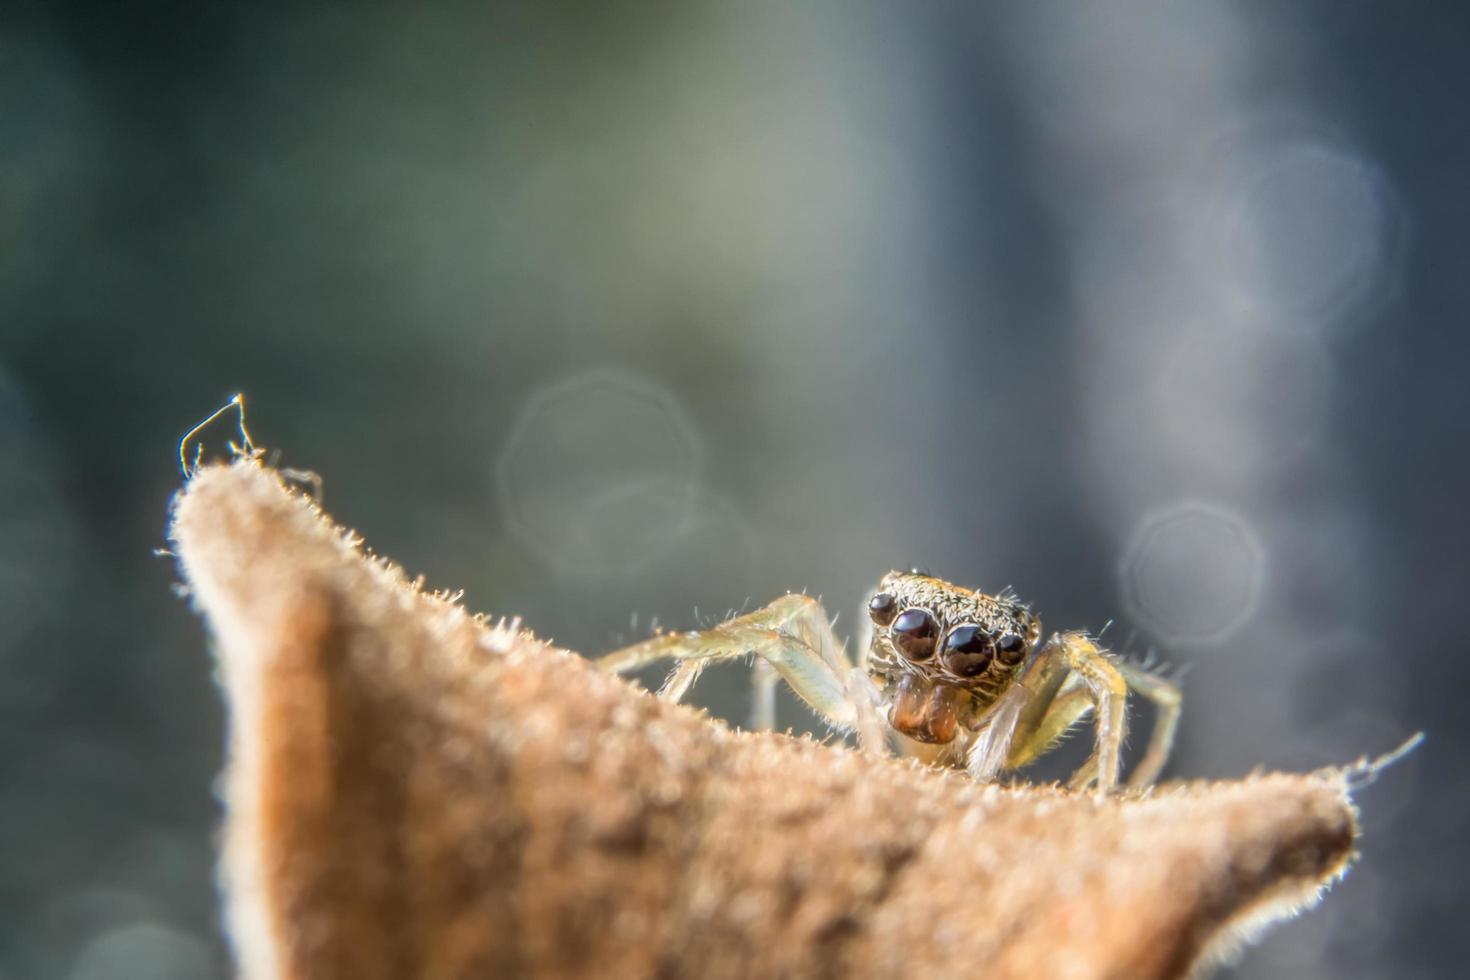 ragno su un ramo foto